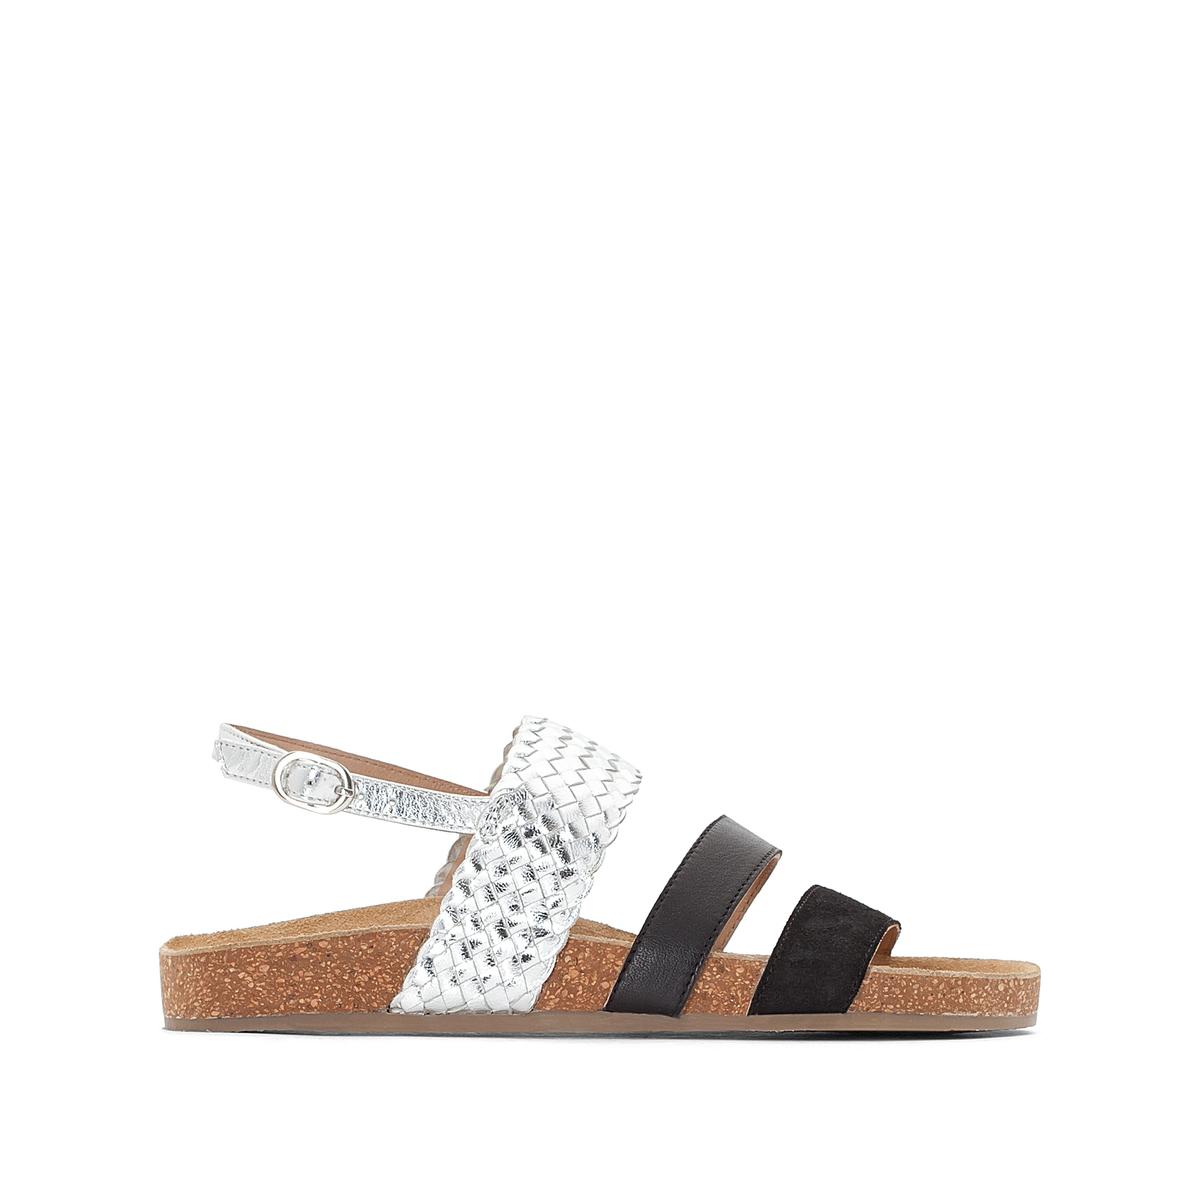 Сандалии кожаные на плоском каблуке